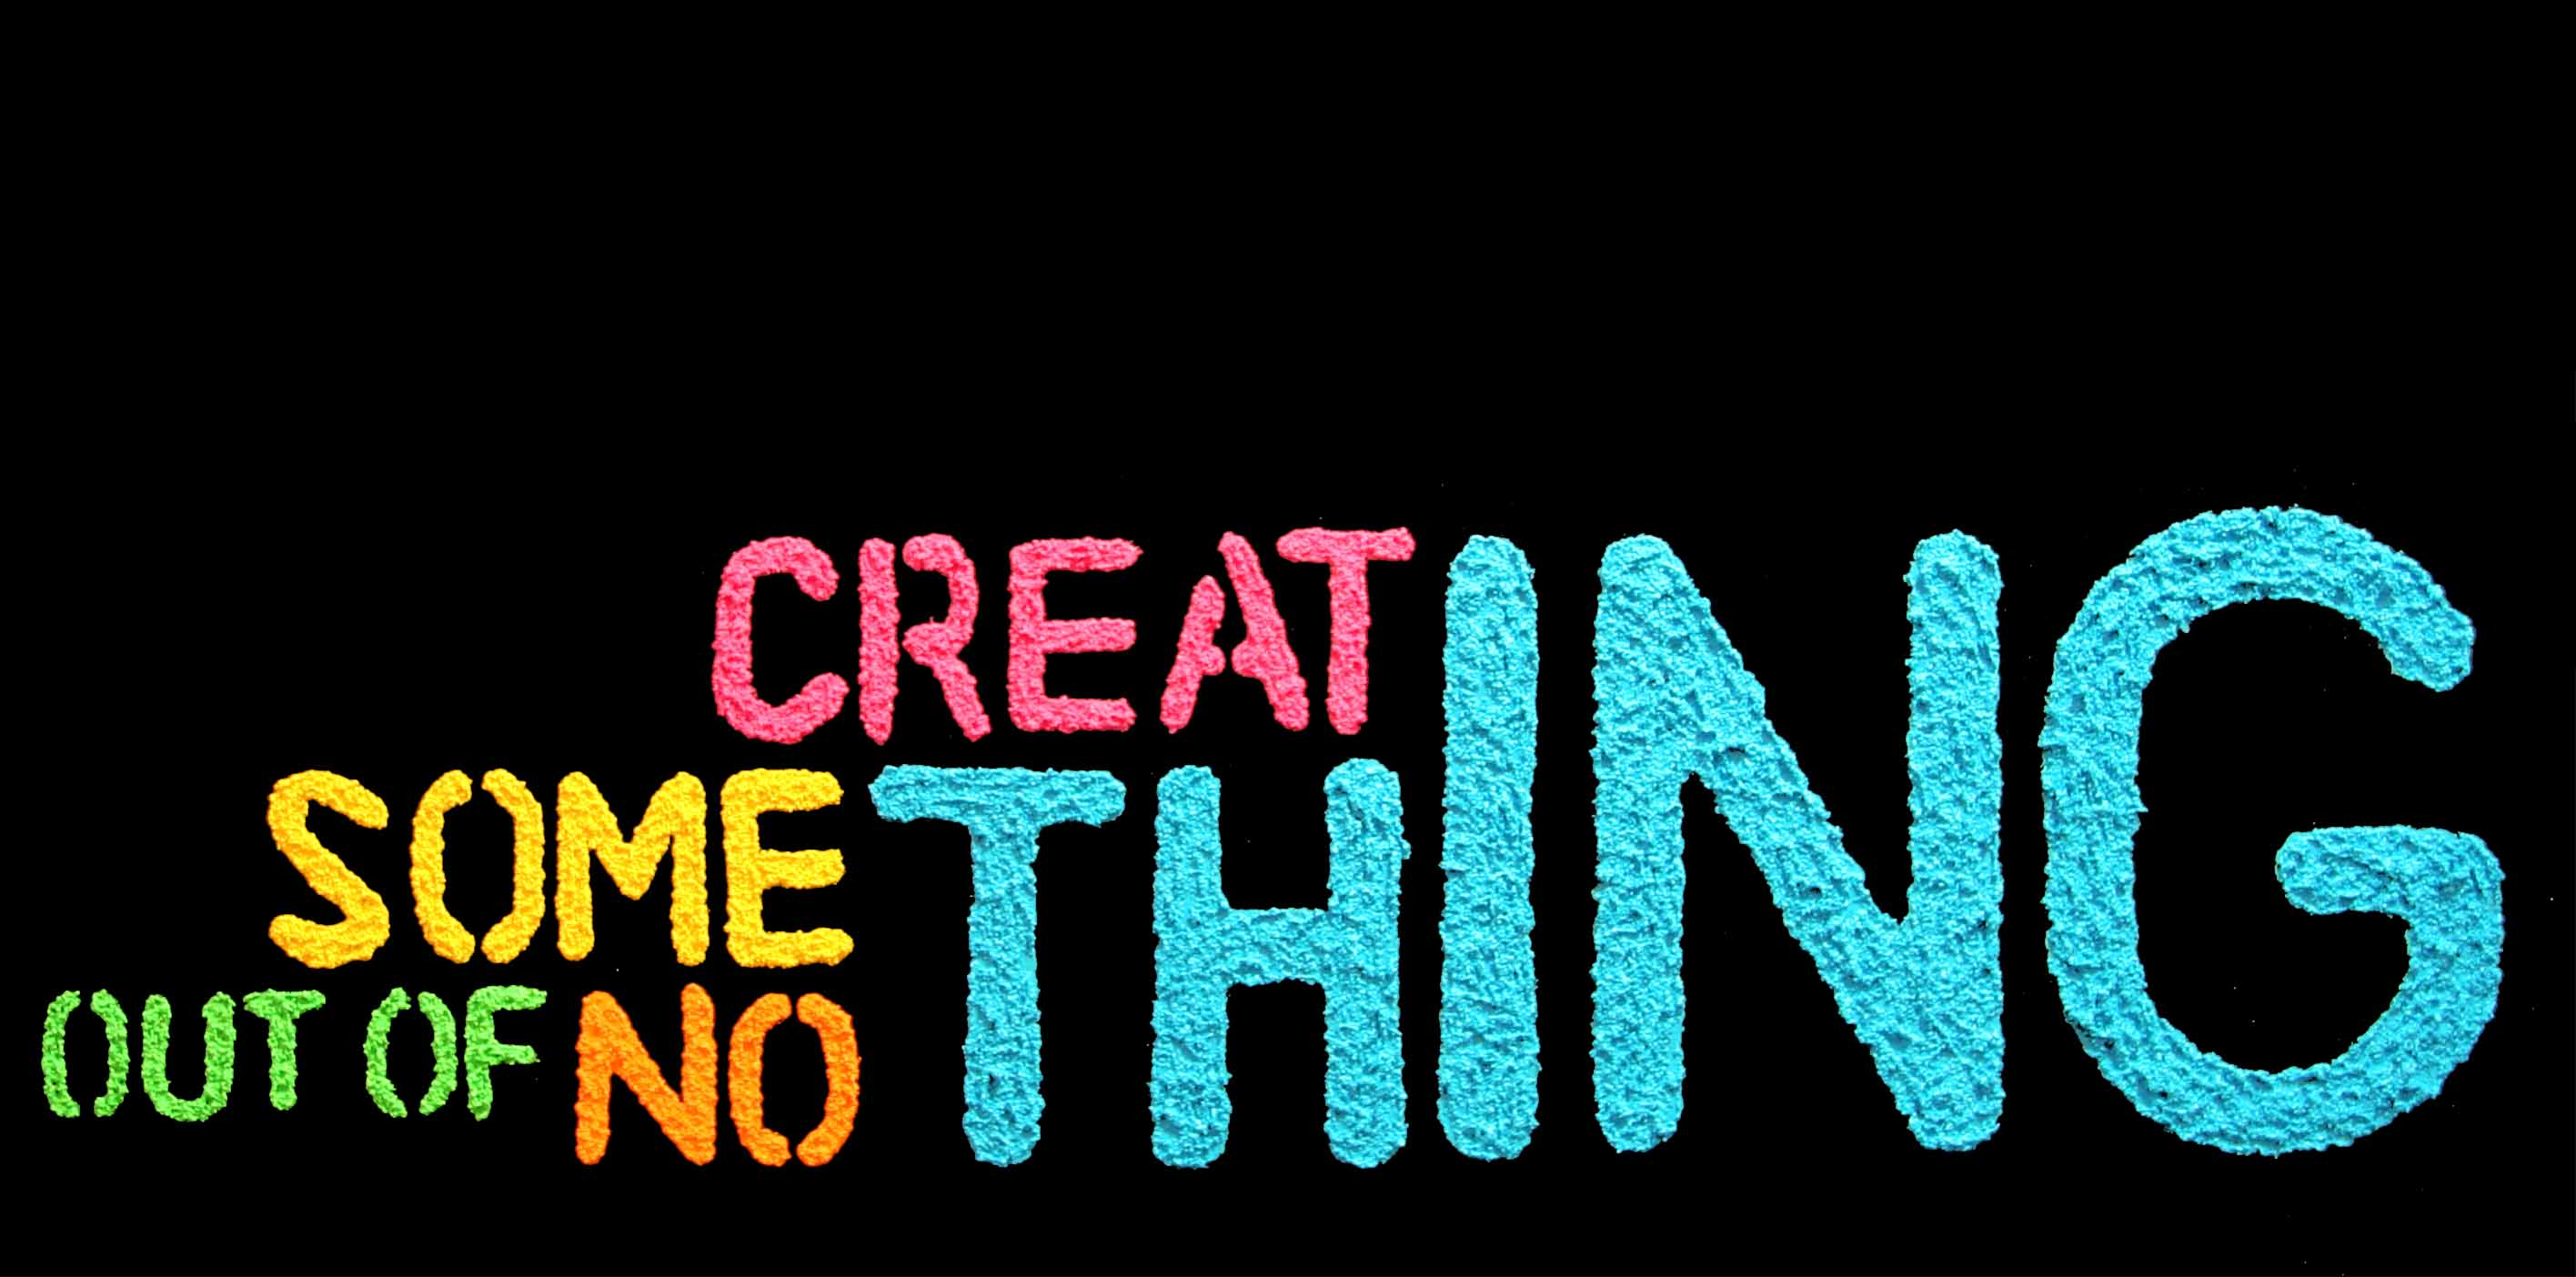 Value - Creative